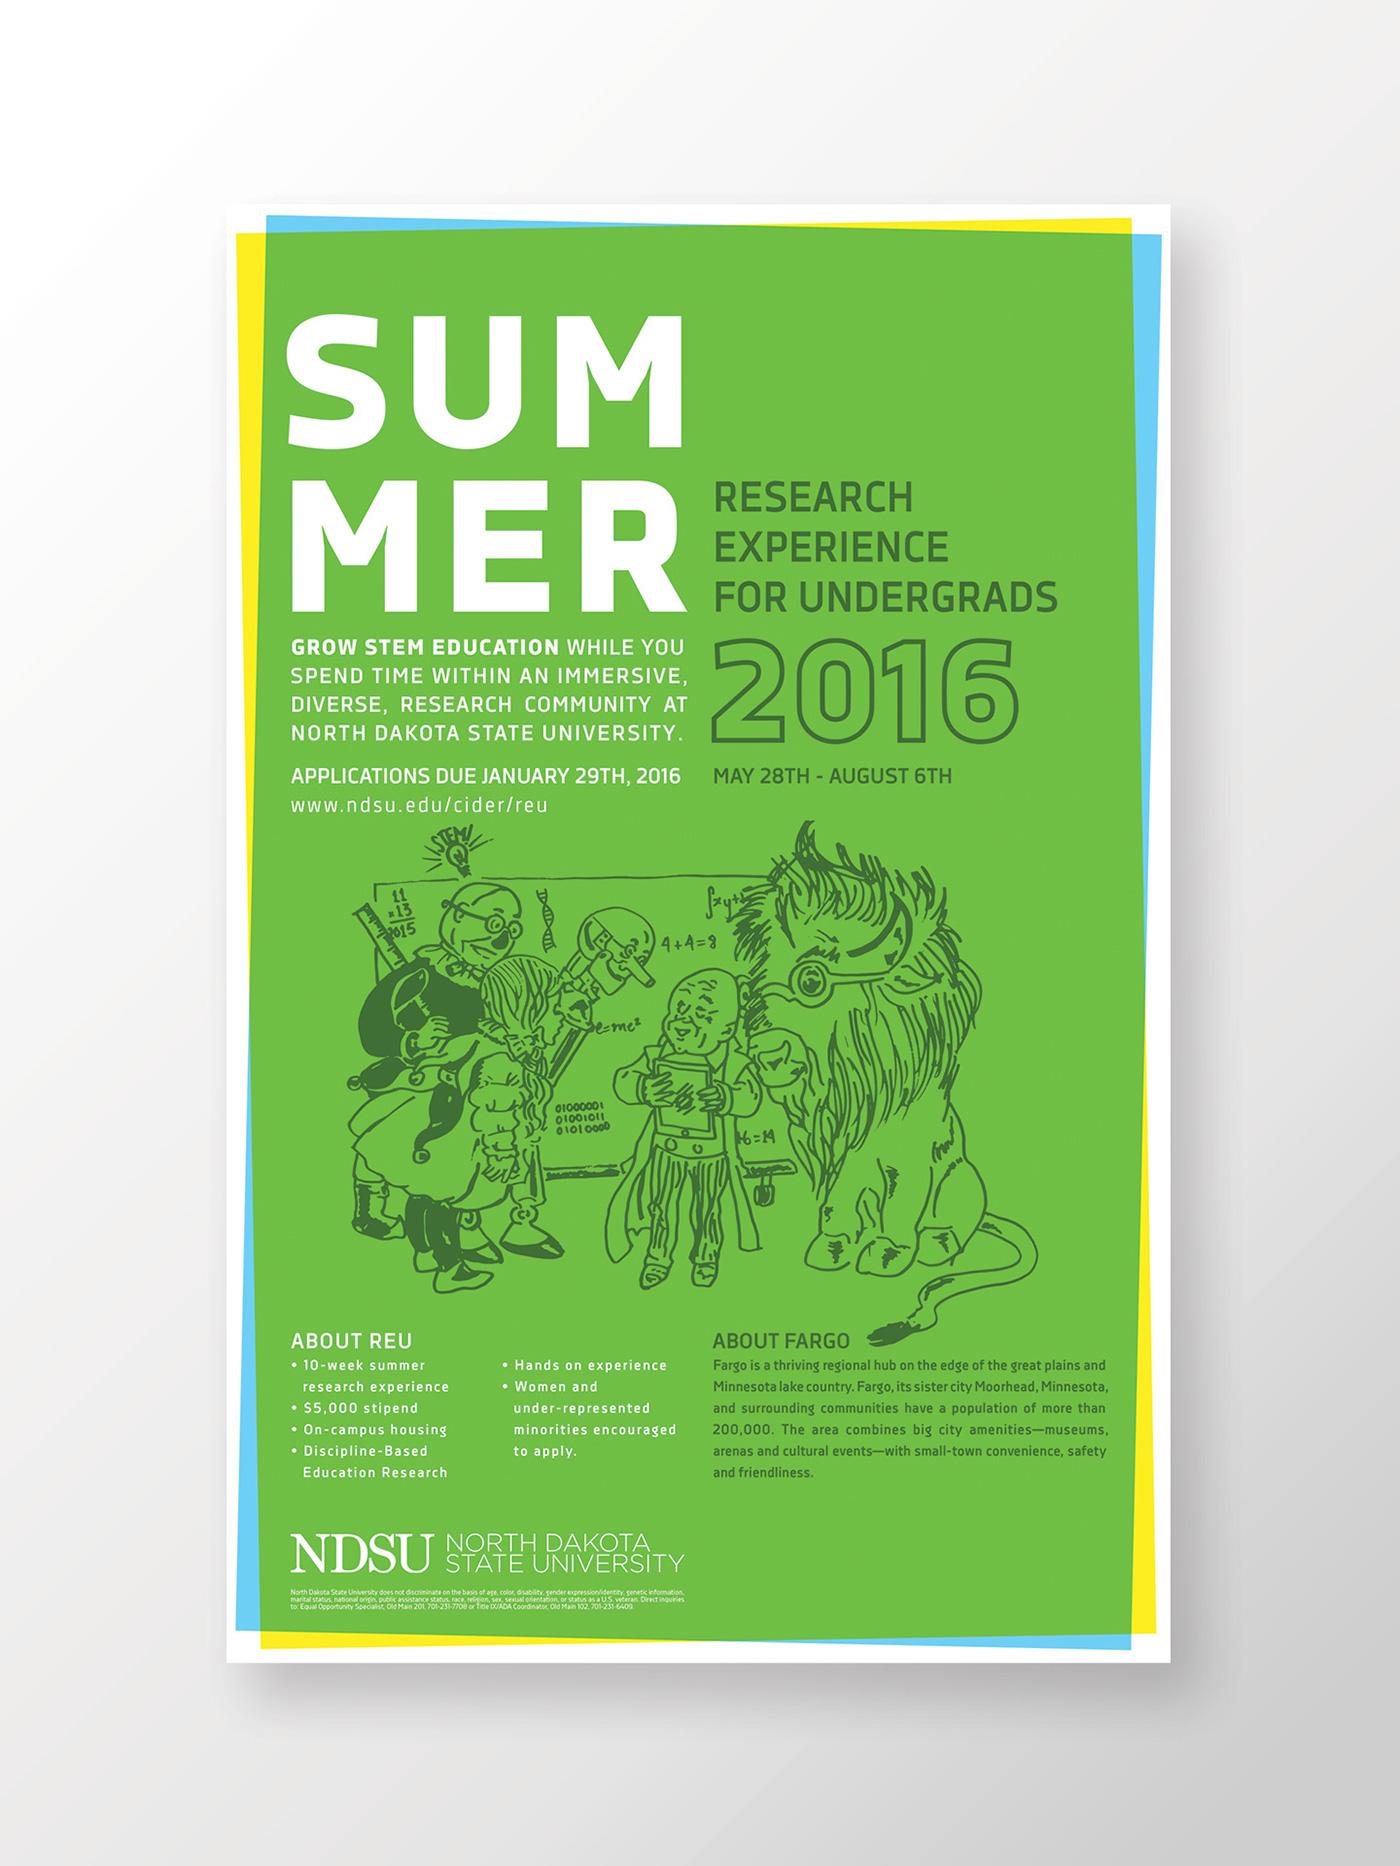 stem denslow Education research nupolitan